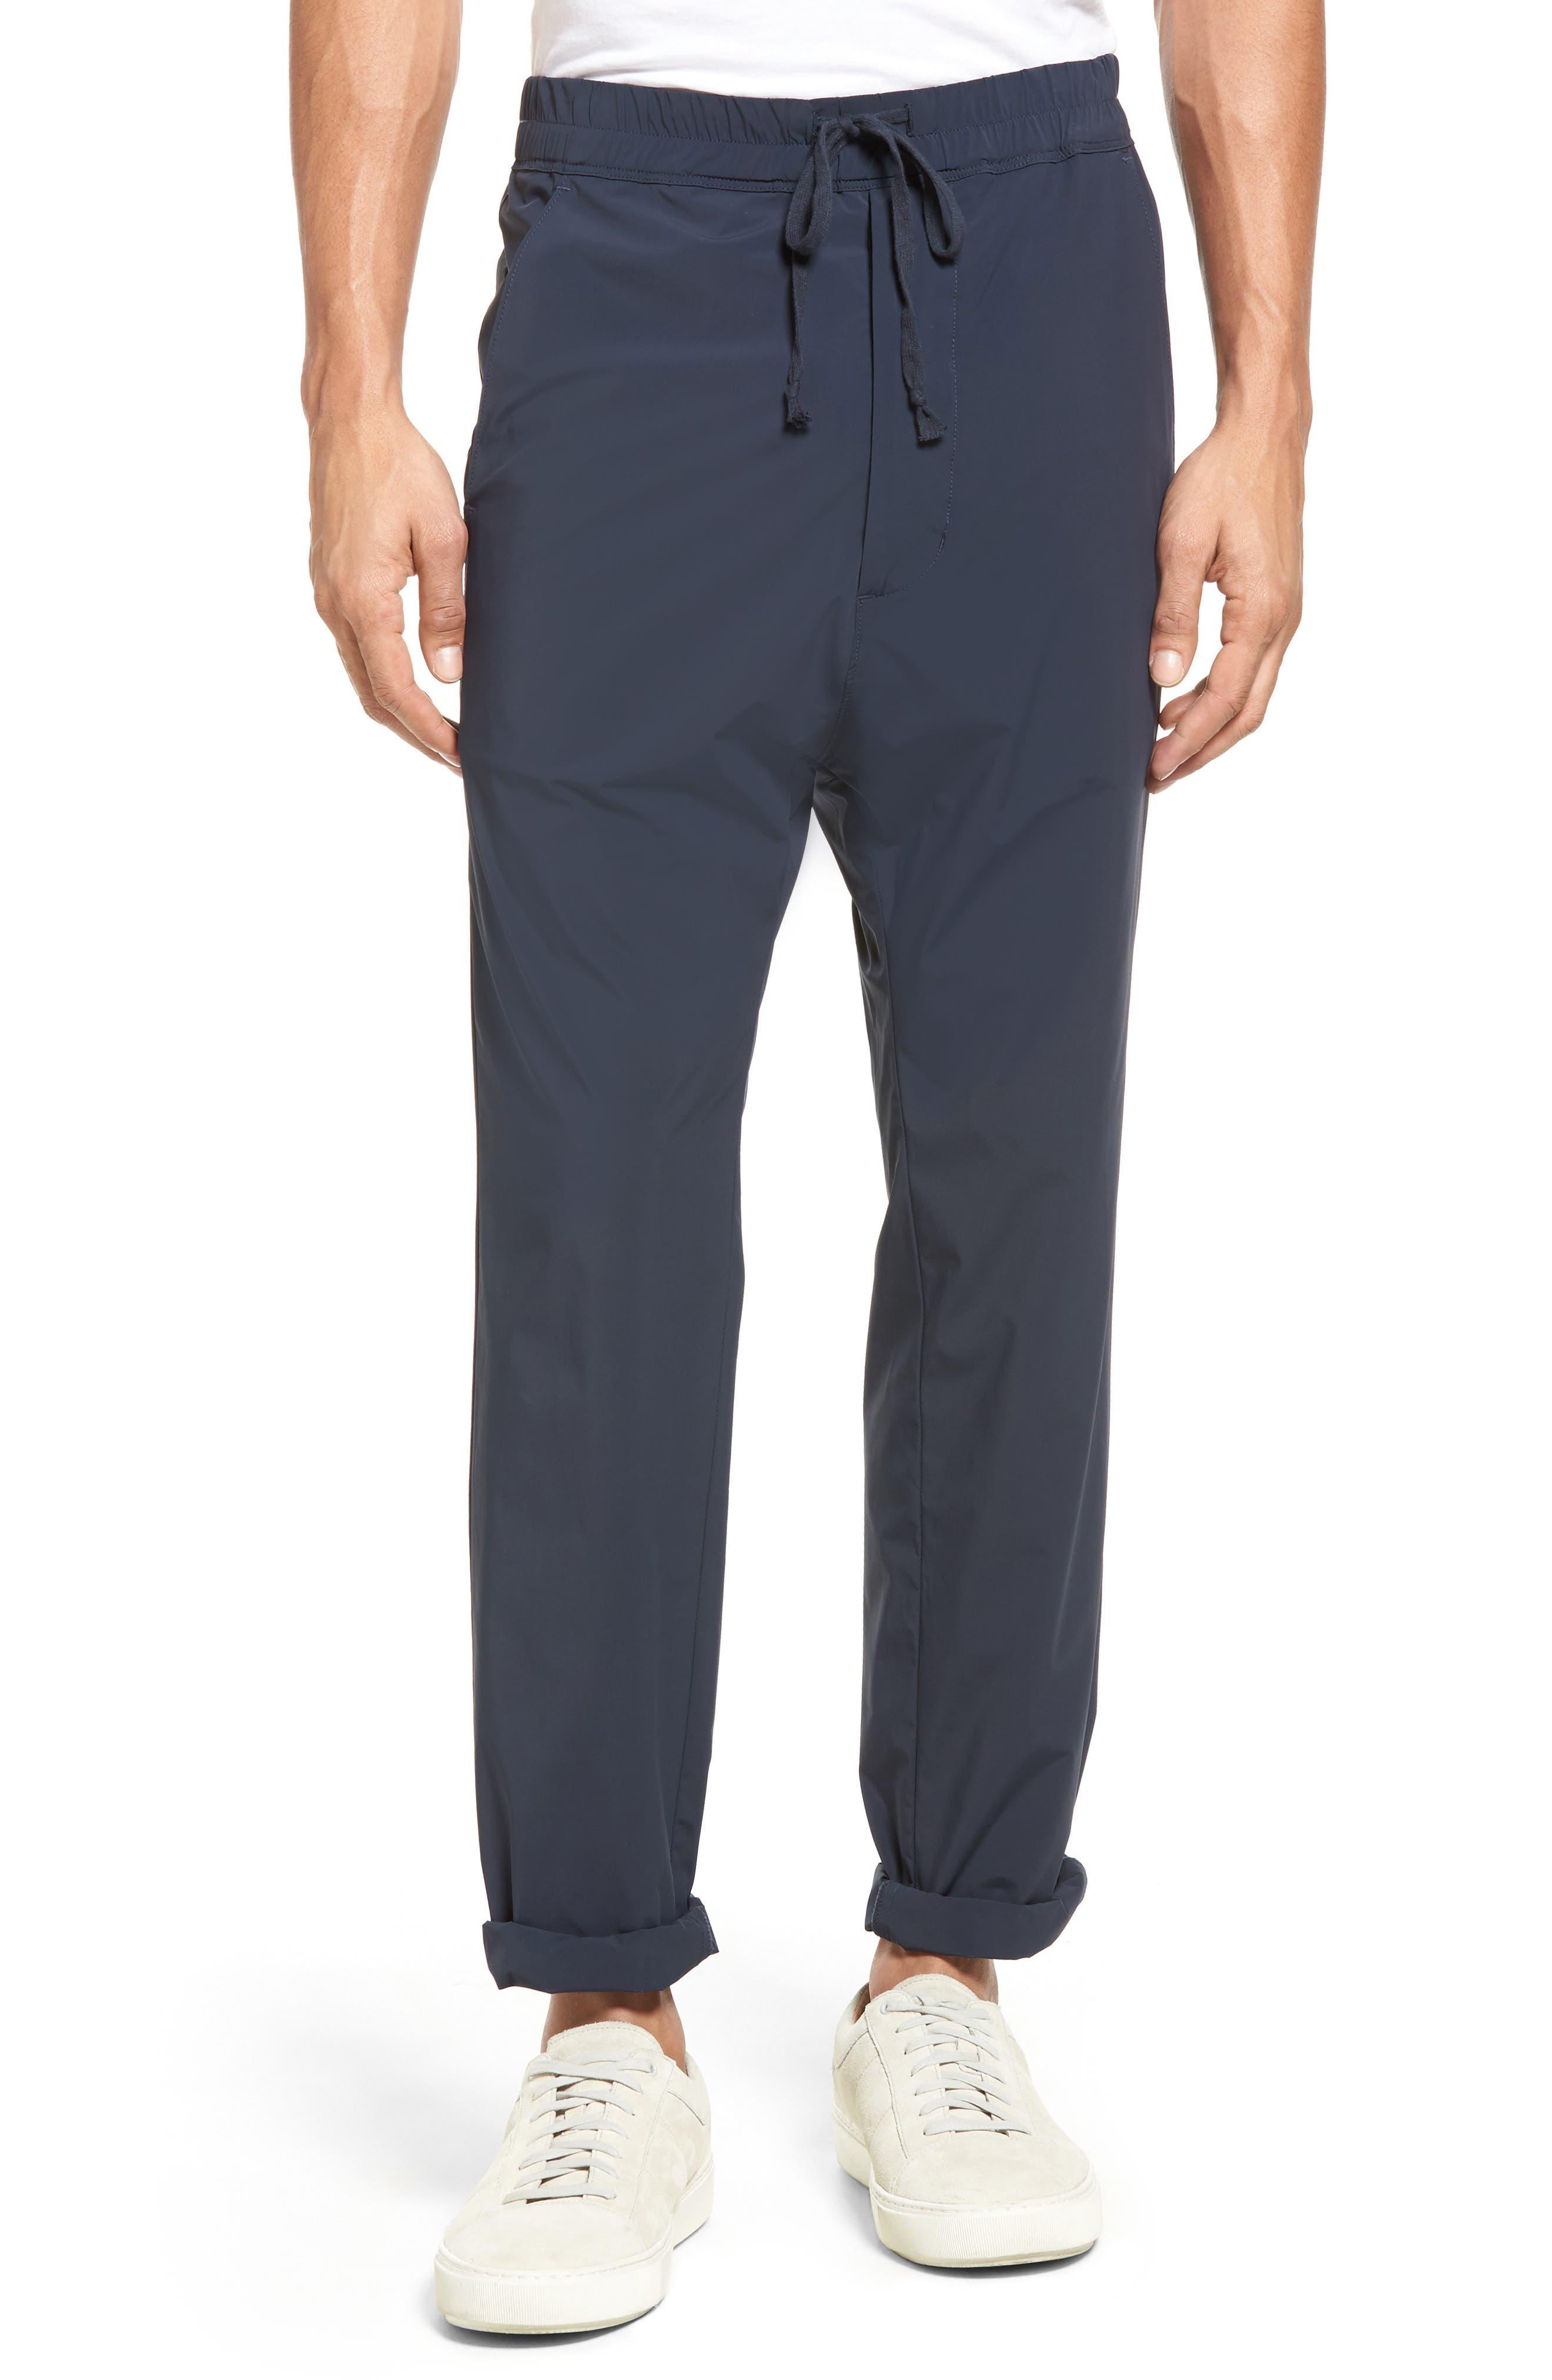 Vince Drop Crotch Jogger Pants